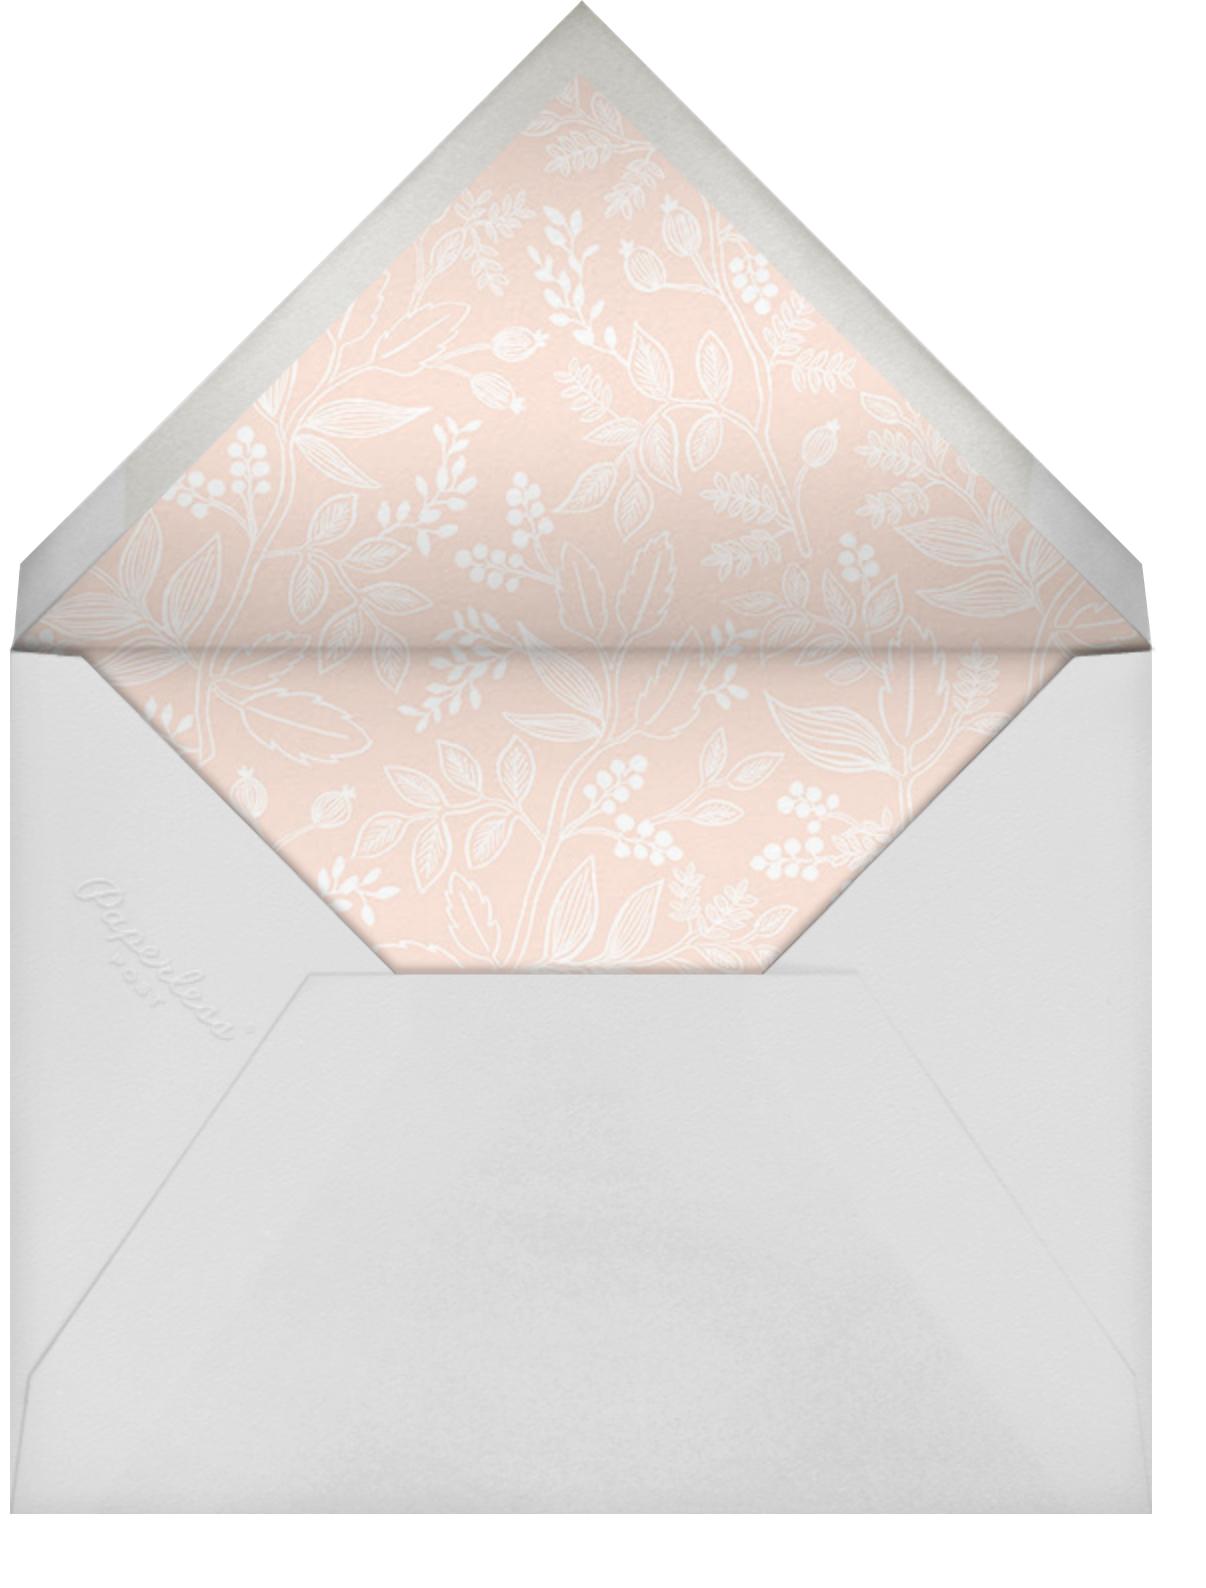 Queen Anne - Rifle Paper Co. - Winter parties - envelope back